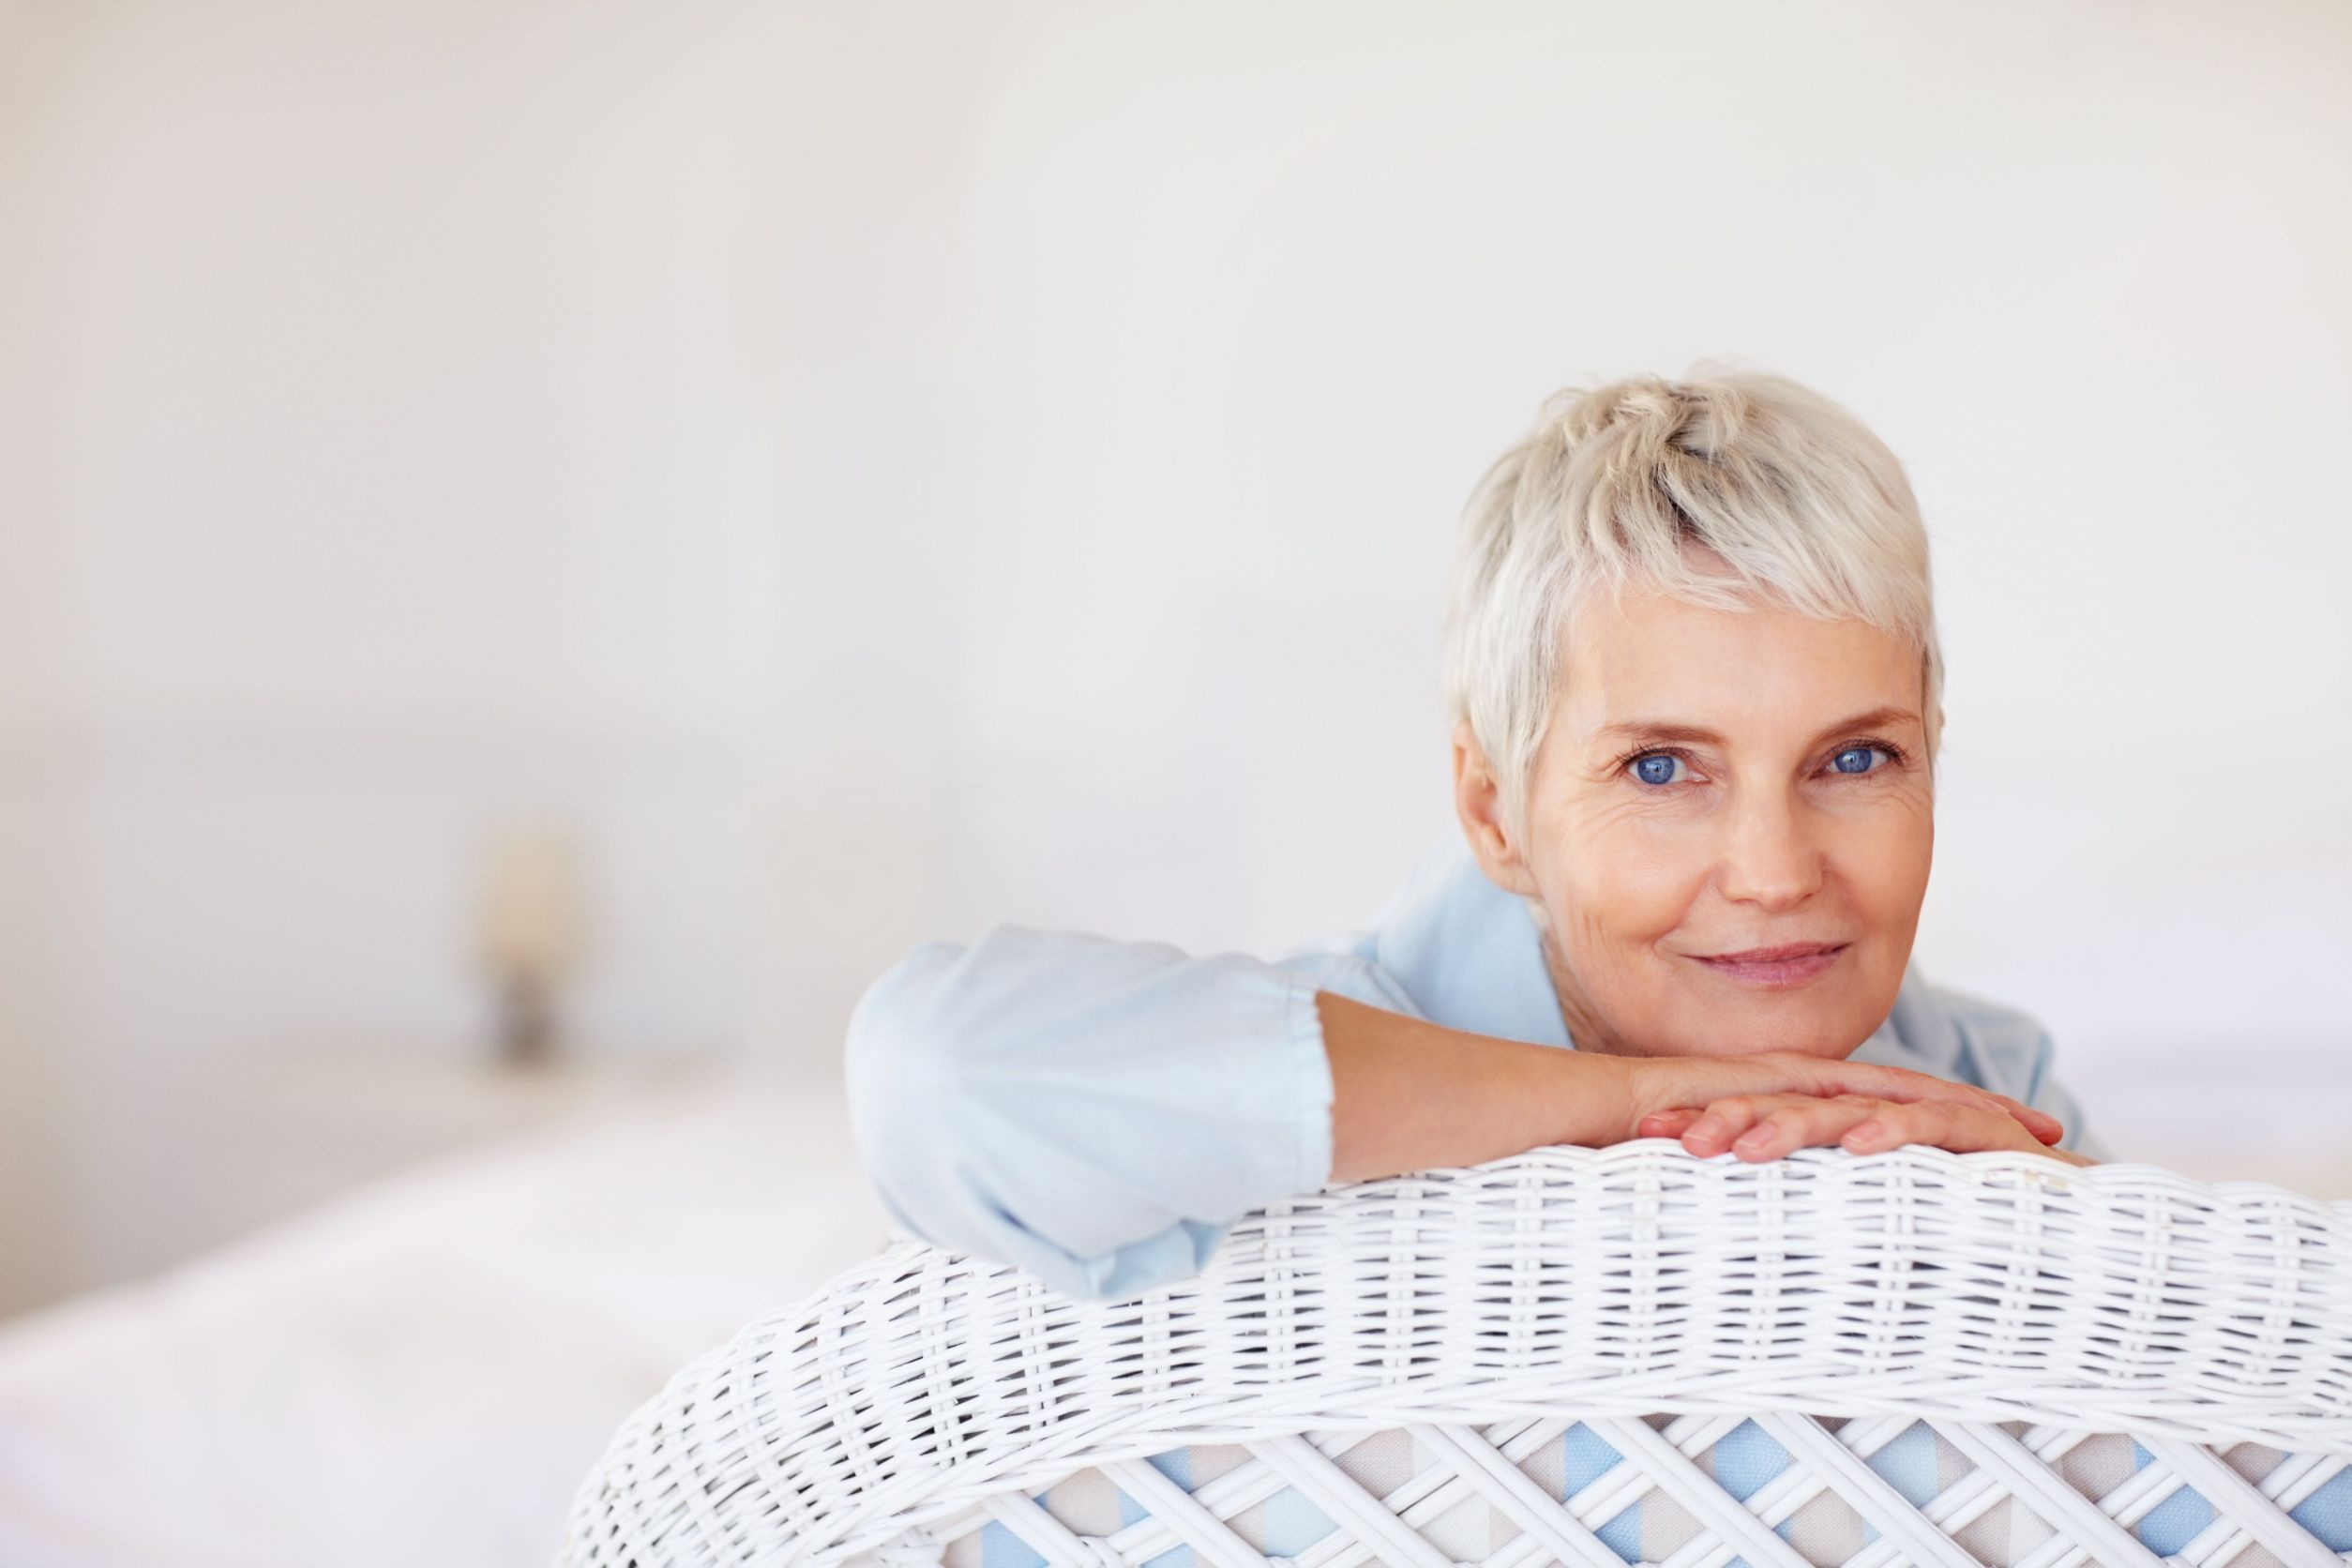 dietoterapia-en-menopausia